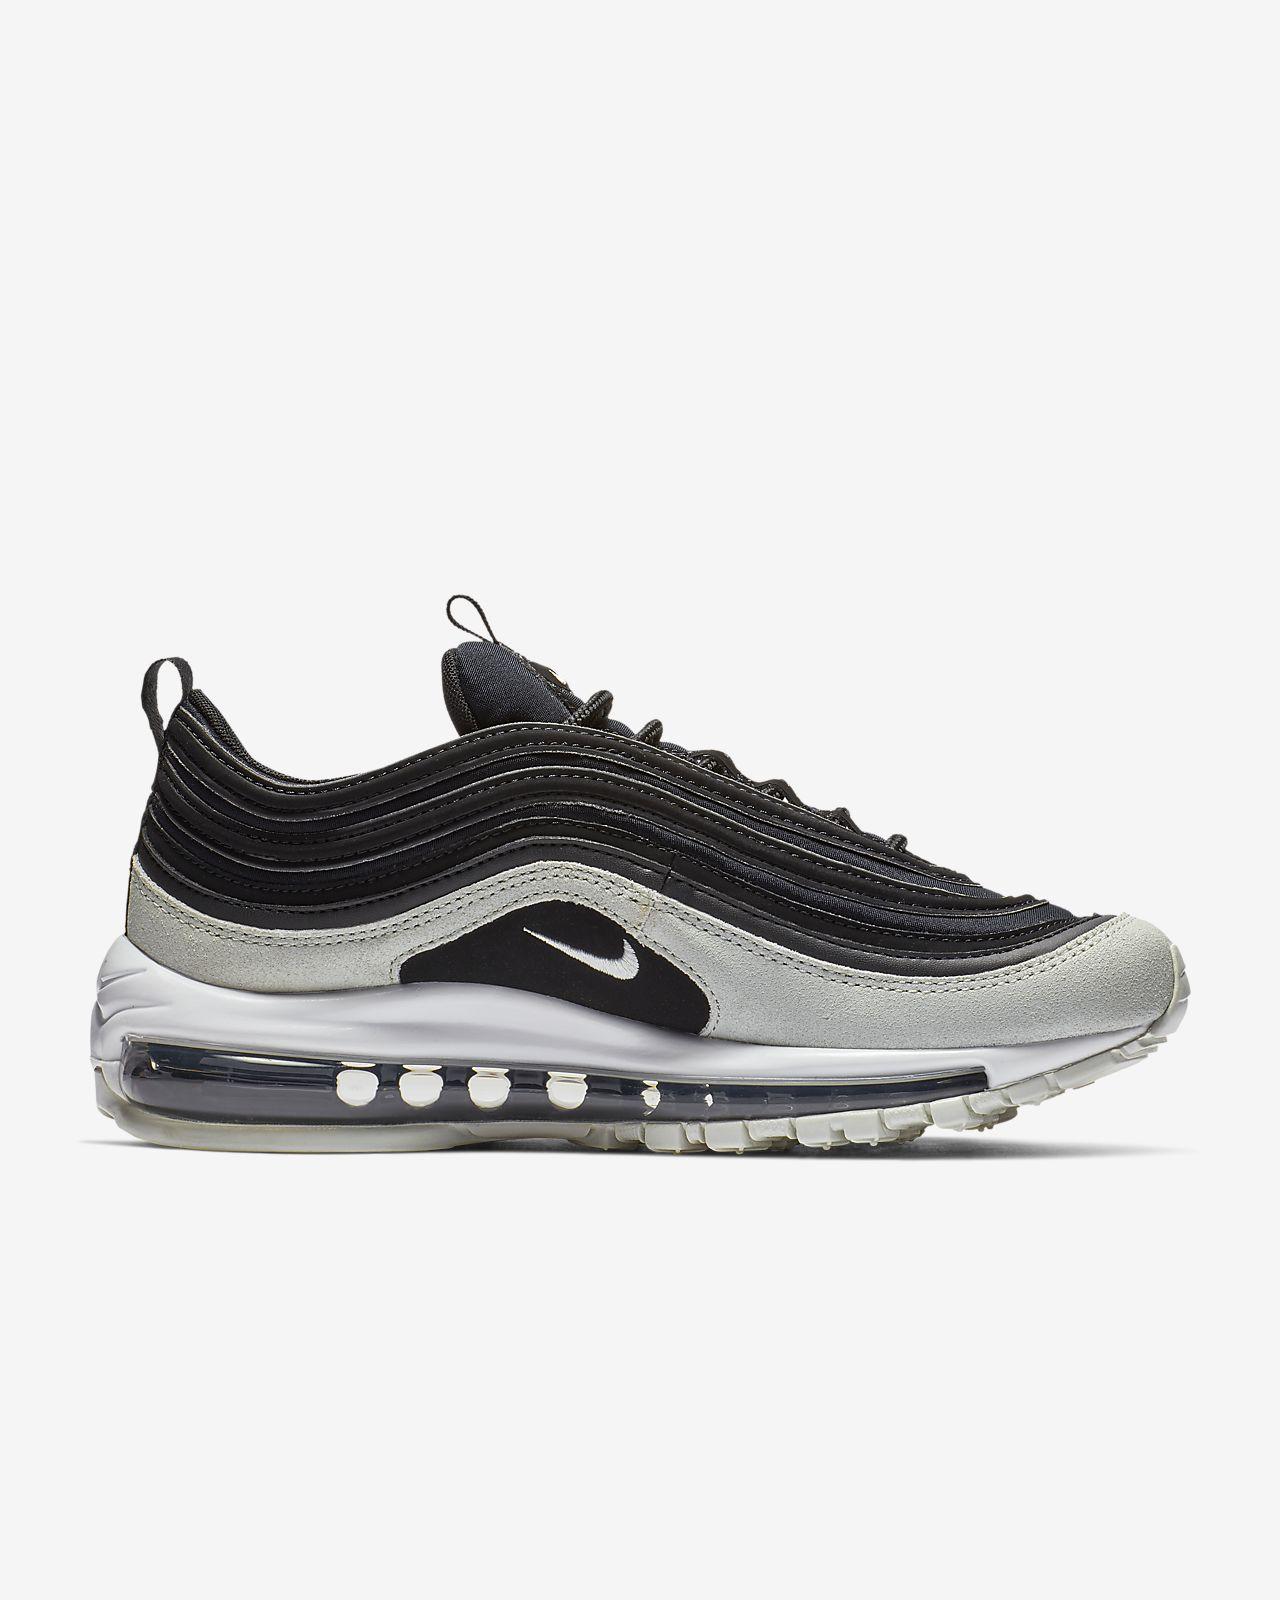 promo code 0632c 08b06 ... Nike Air Max 97 Premium Women s Shoe